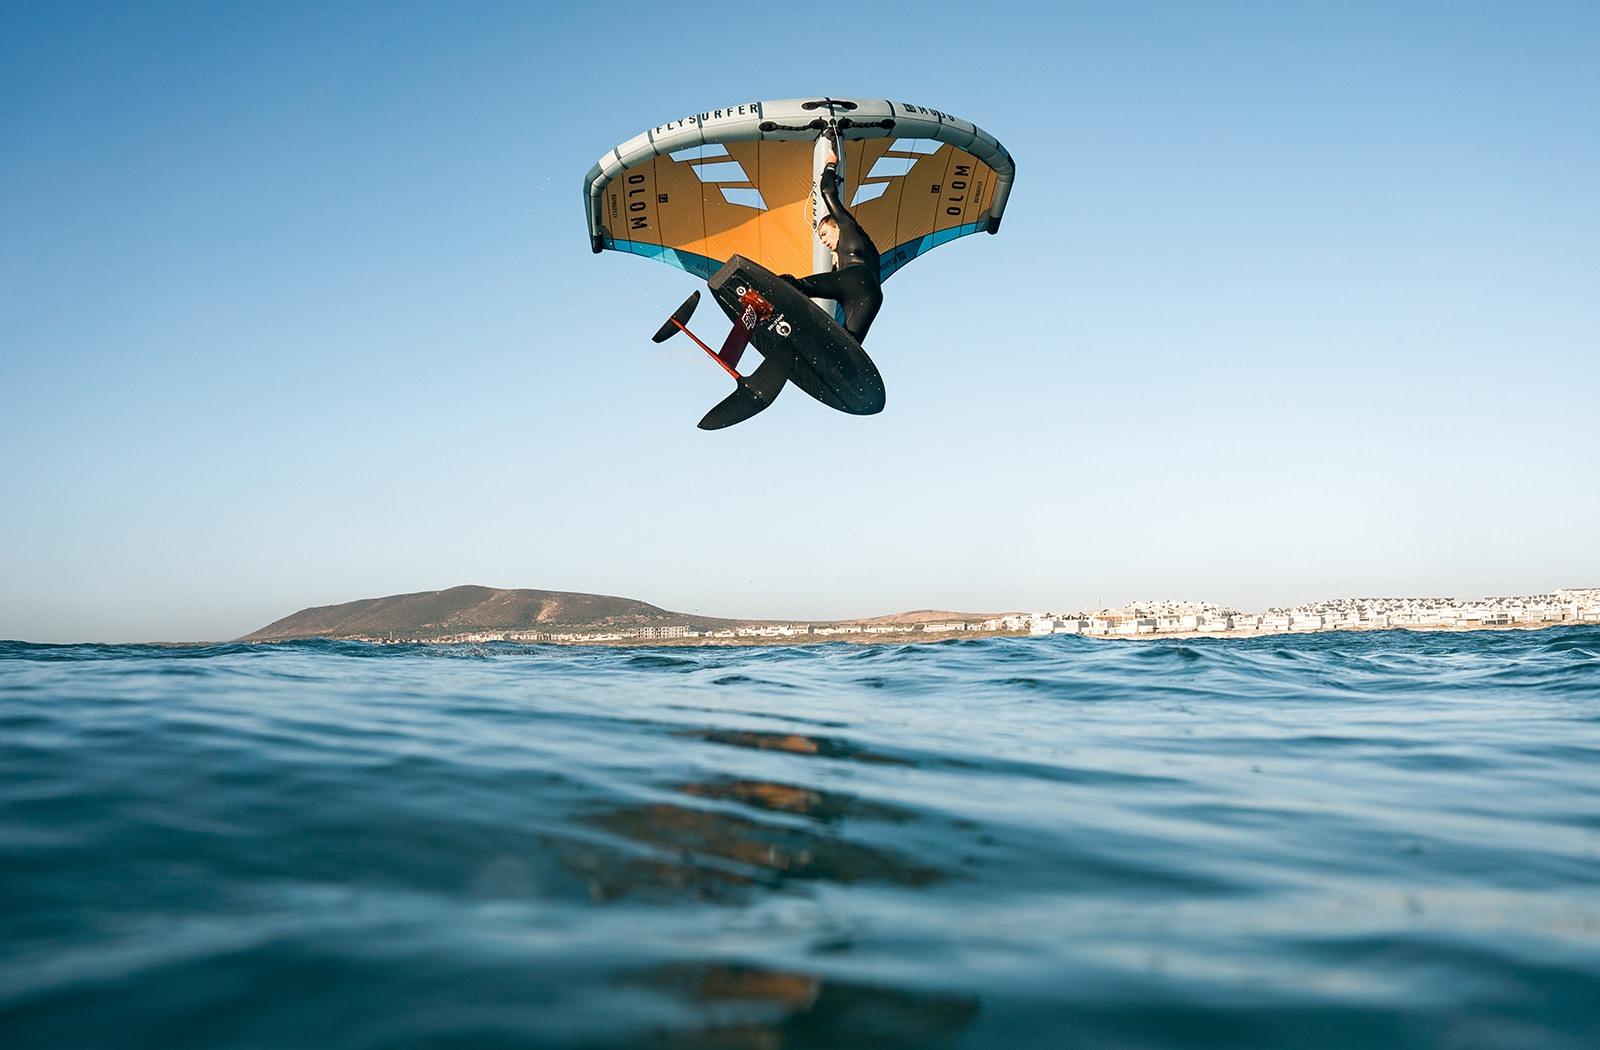 Flysurfer-MOJO-04-by-MiriamJoanna